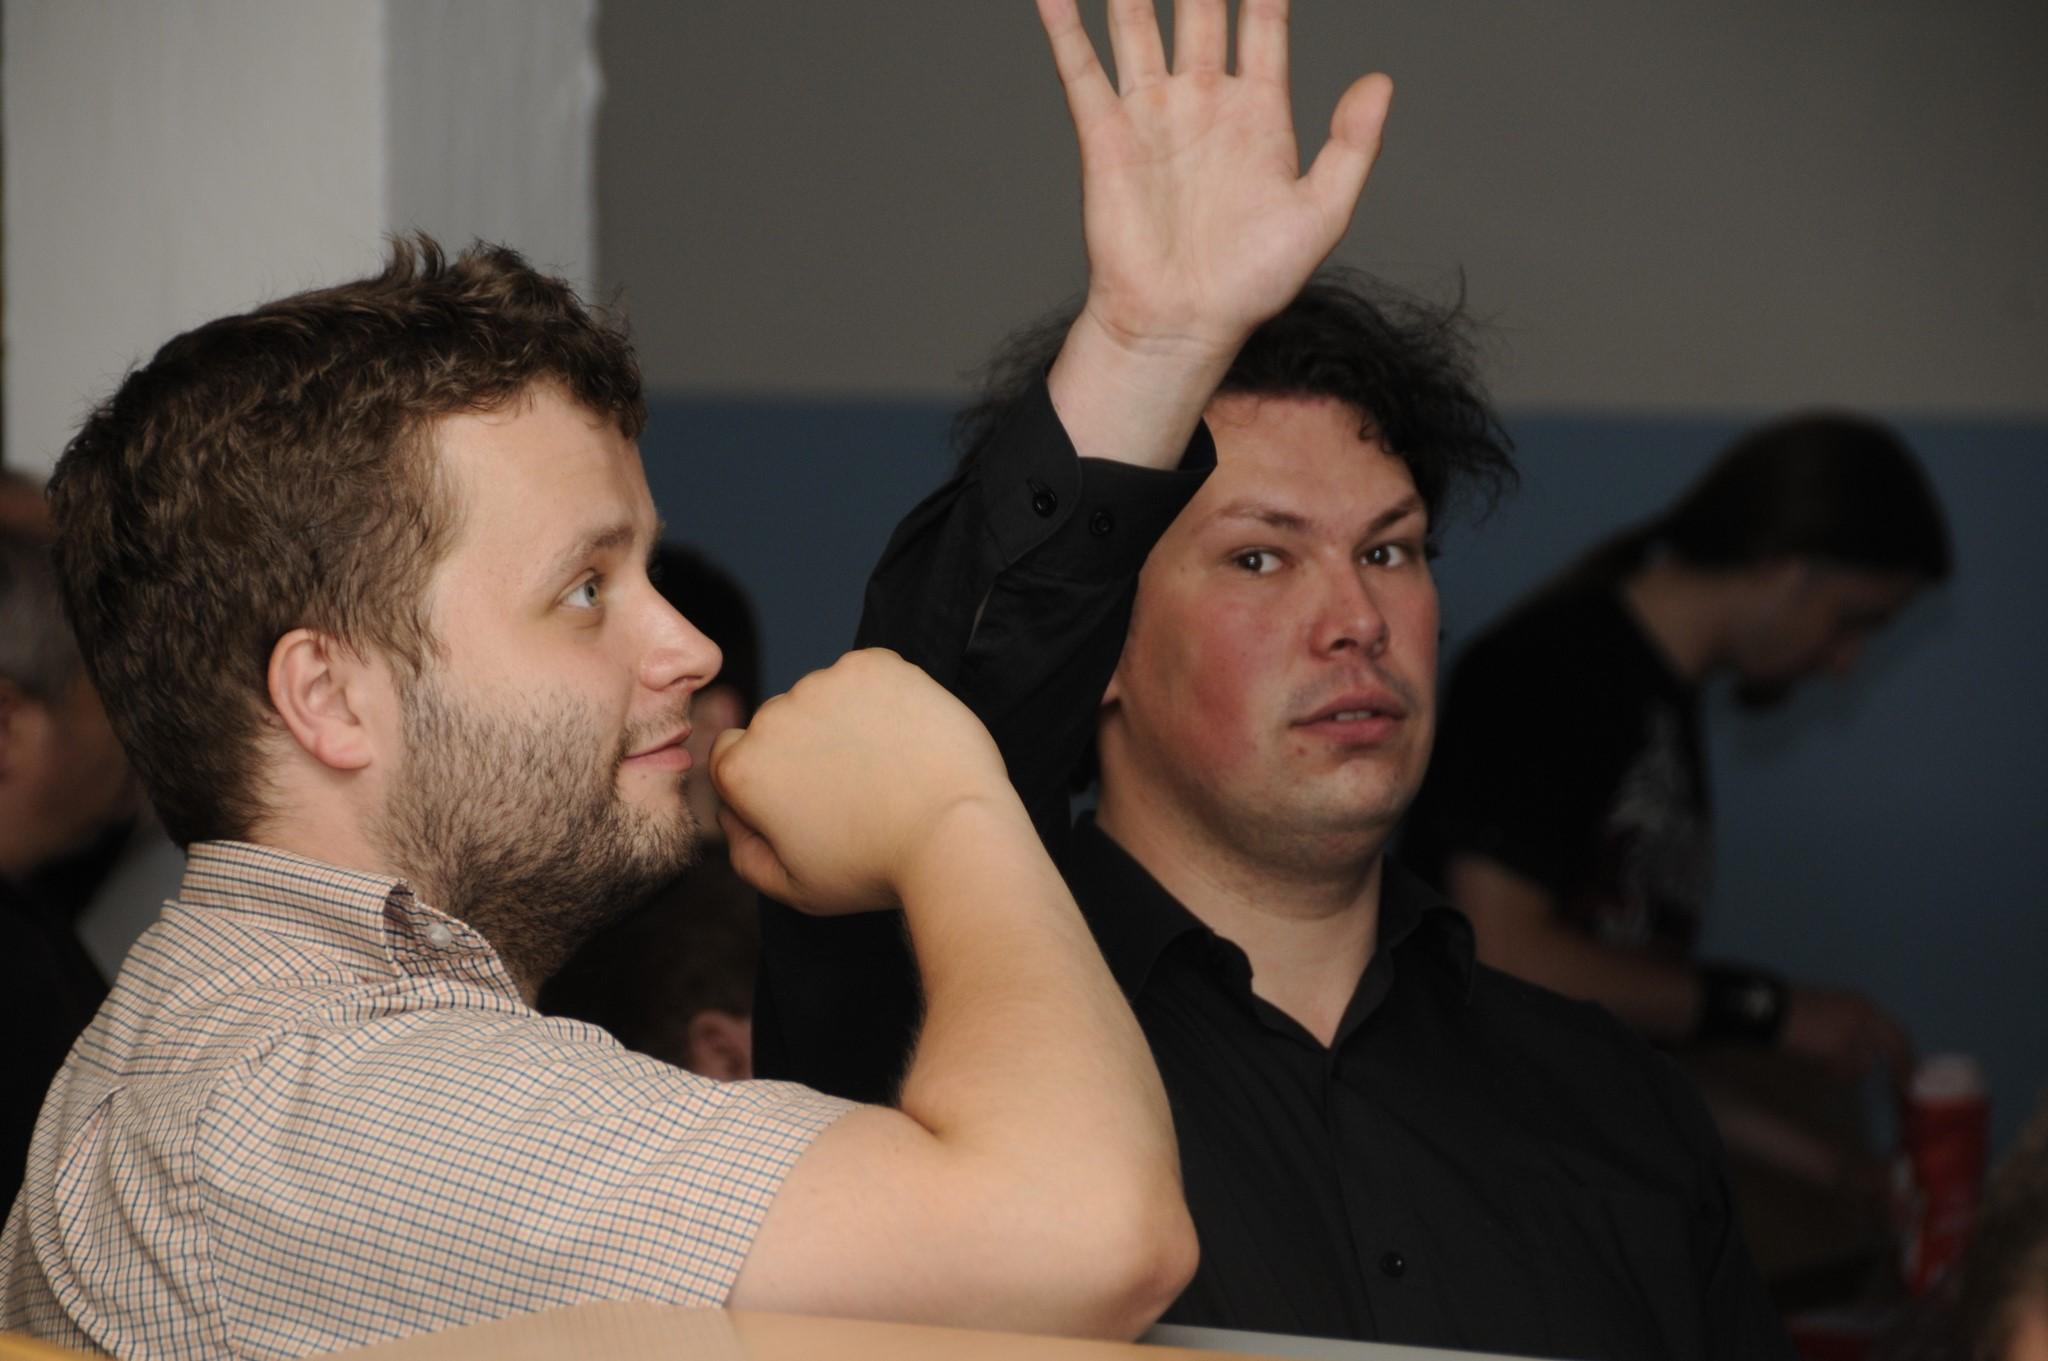 Wieczór z Open Source 2009